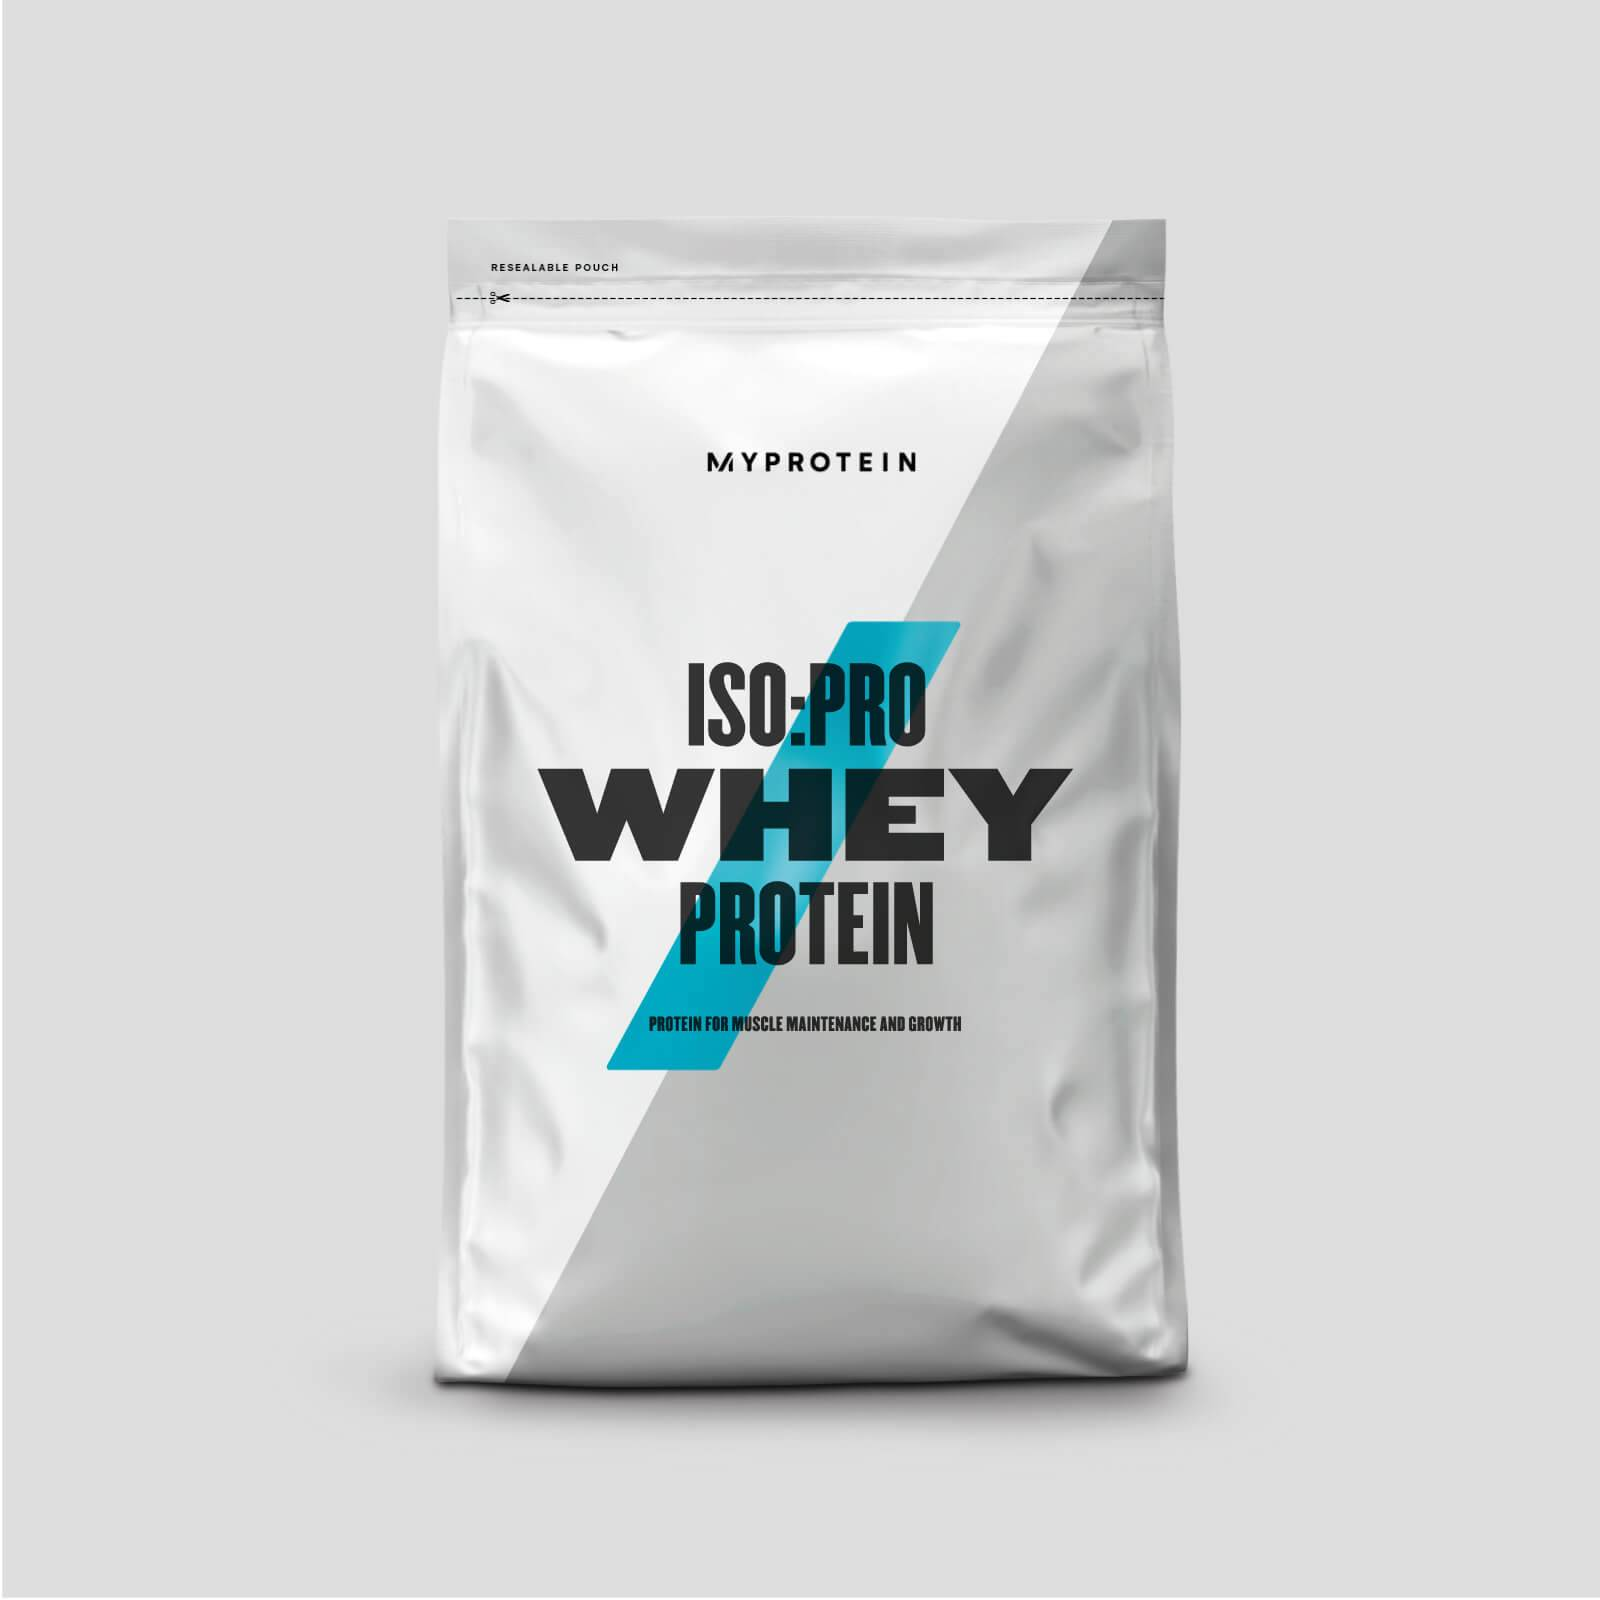 Myprotein ISO: PRO Whey en poudre - 1kg - Sans arôme ajouté